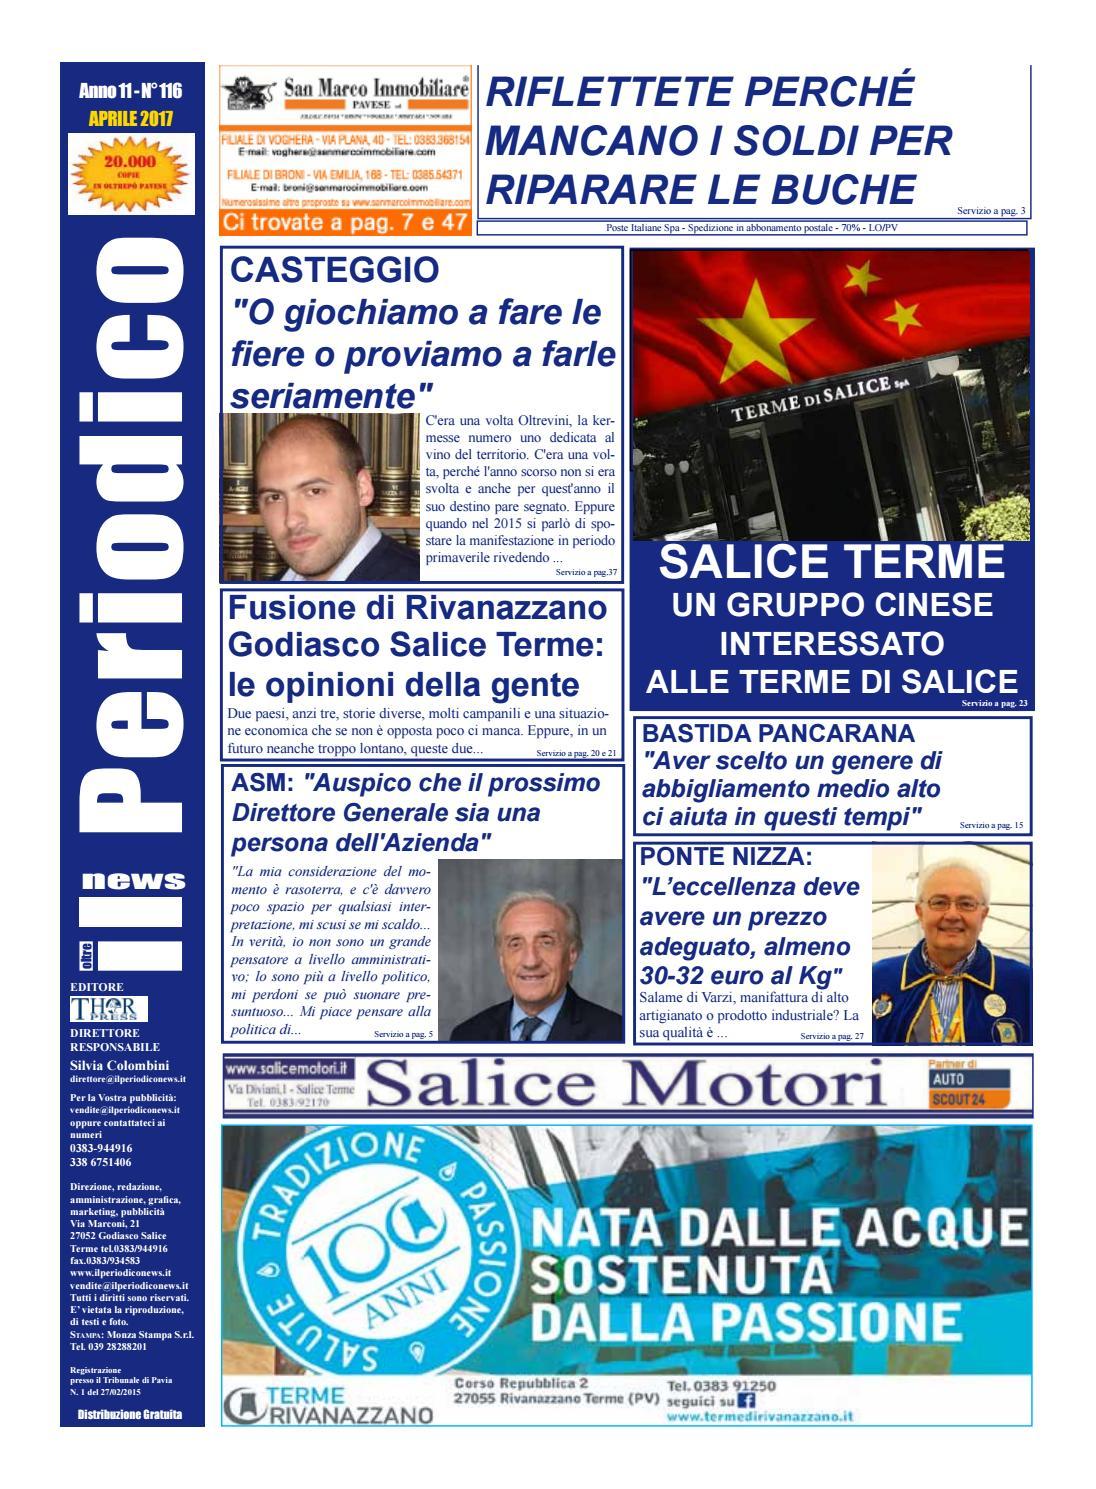 Il Periodico News - APRILE 2017 N°116 by IlPeriodicoNews - issuu 982b139bcb8f